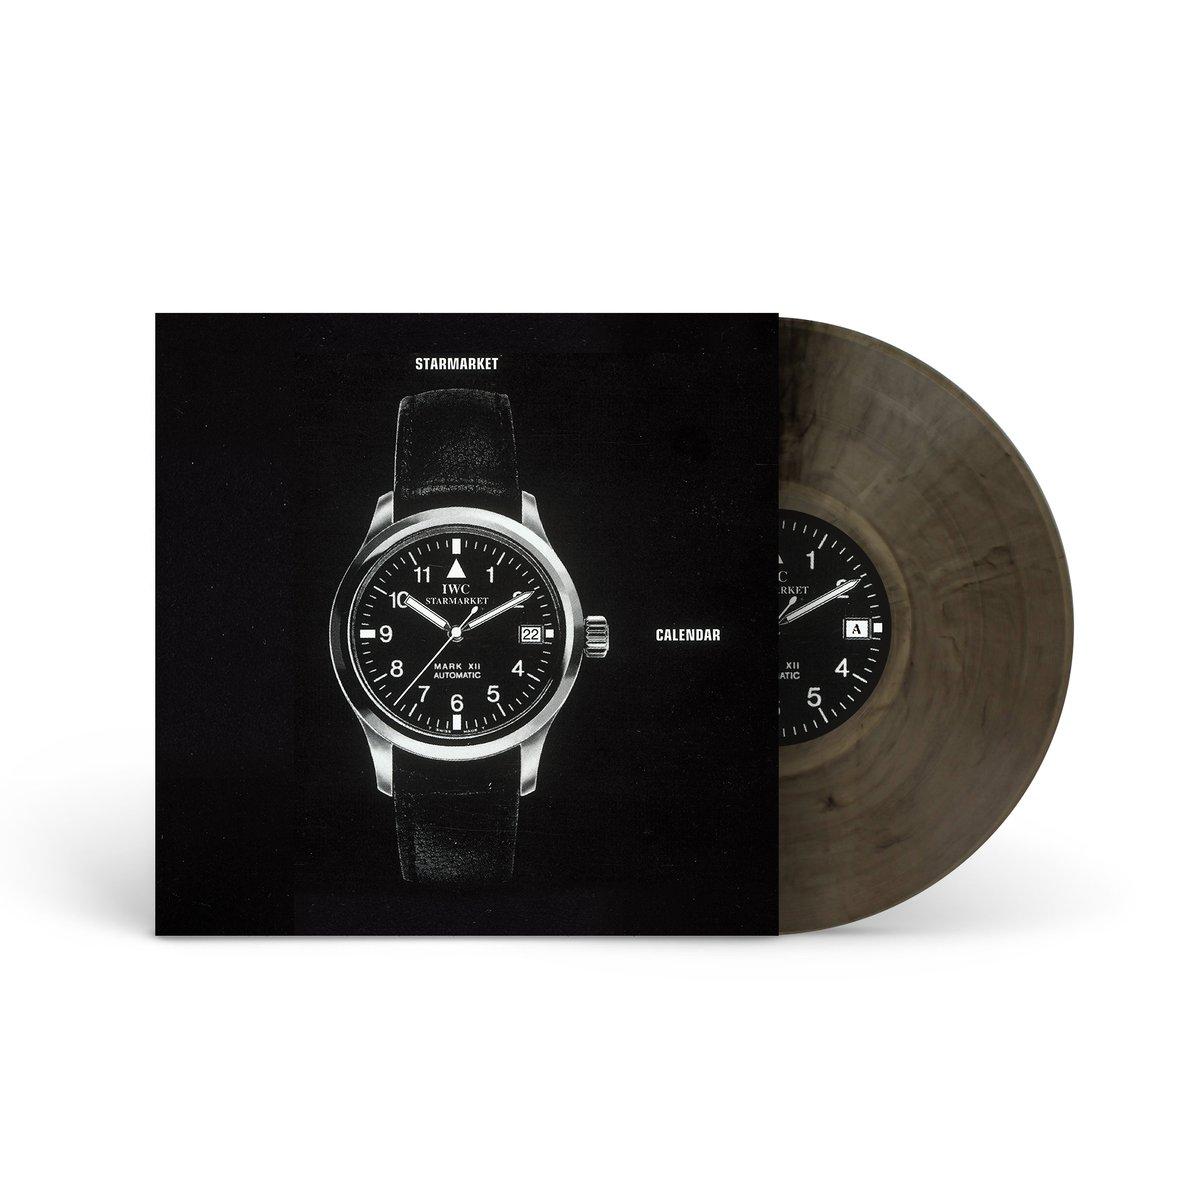 Image of Starmarket - Calendar LP -> PRE ORDER